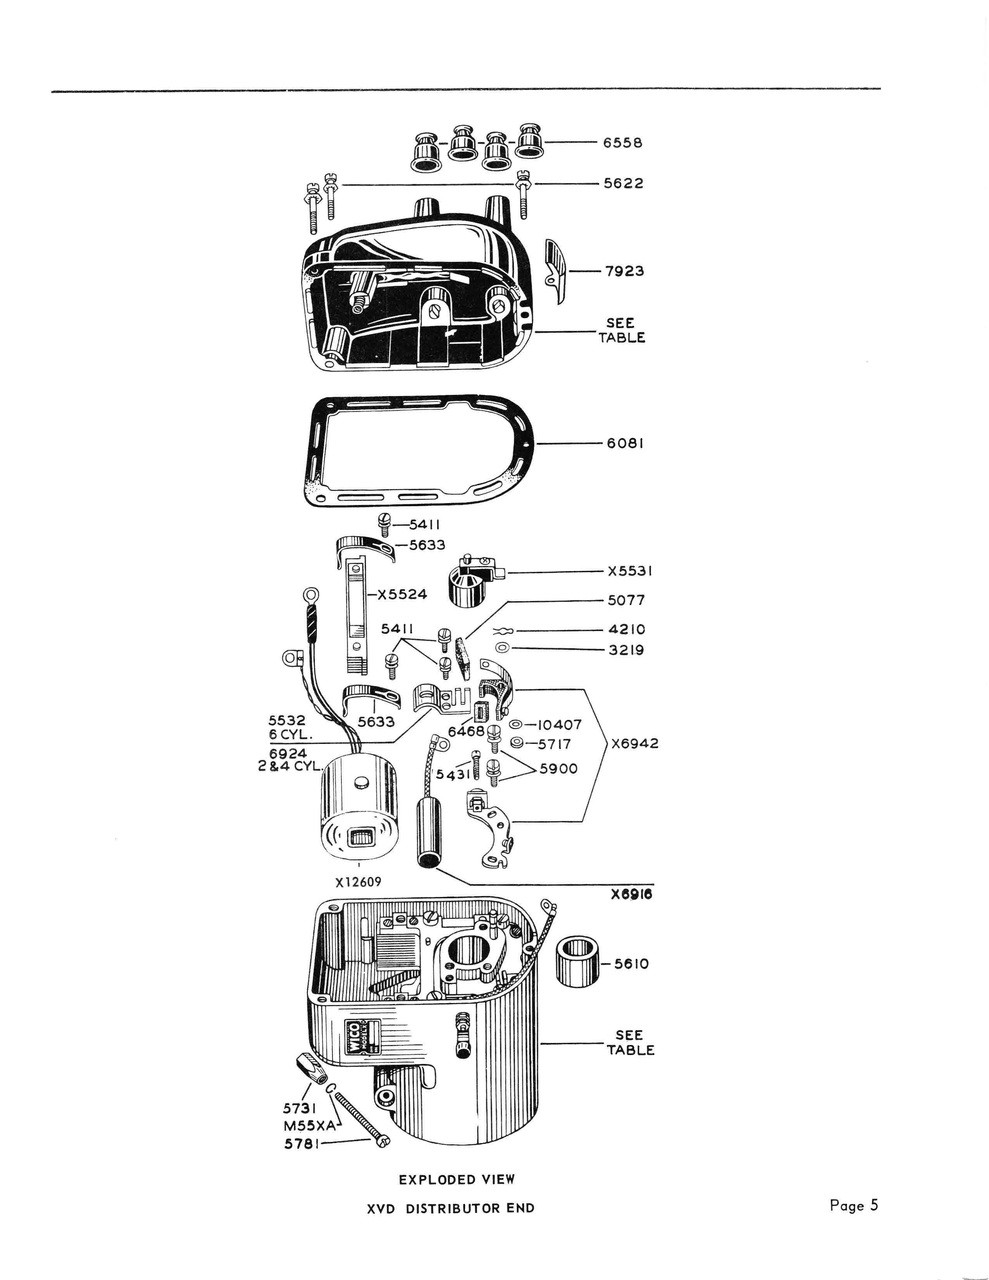 Wico Magneto Diagram Wiring Library 23 Hp Kohler Engine Parts Xb Data Schema Gravely Points Photo